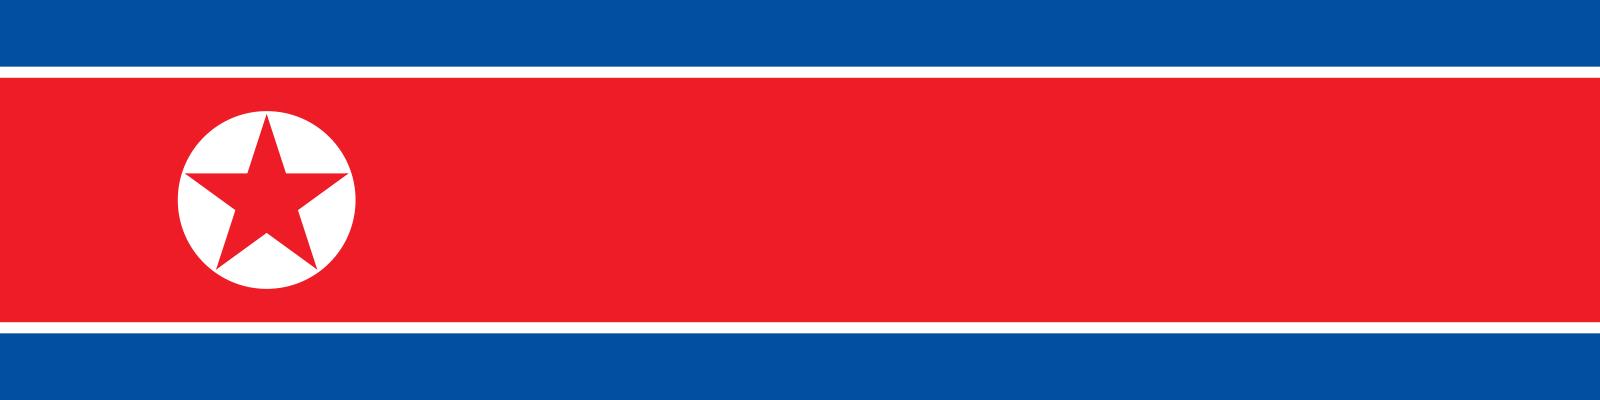 NK-Flag | Porter Yates